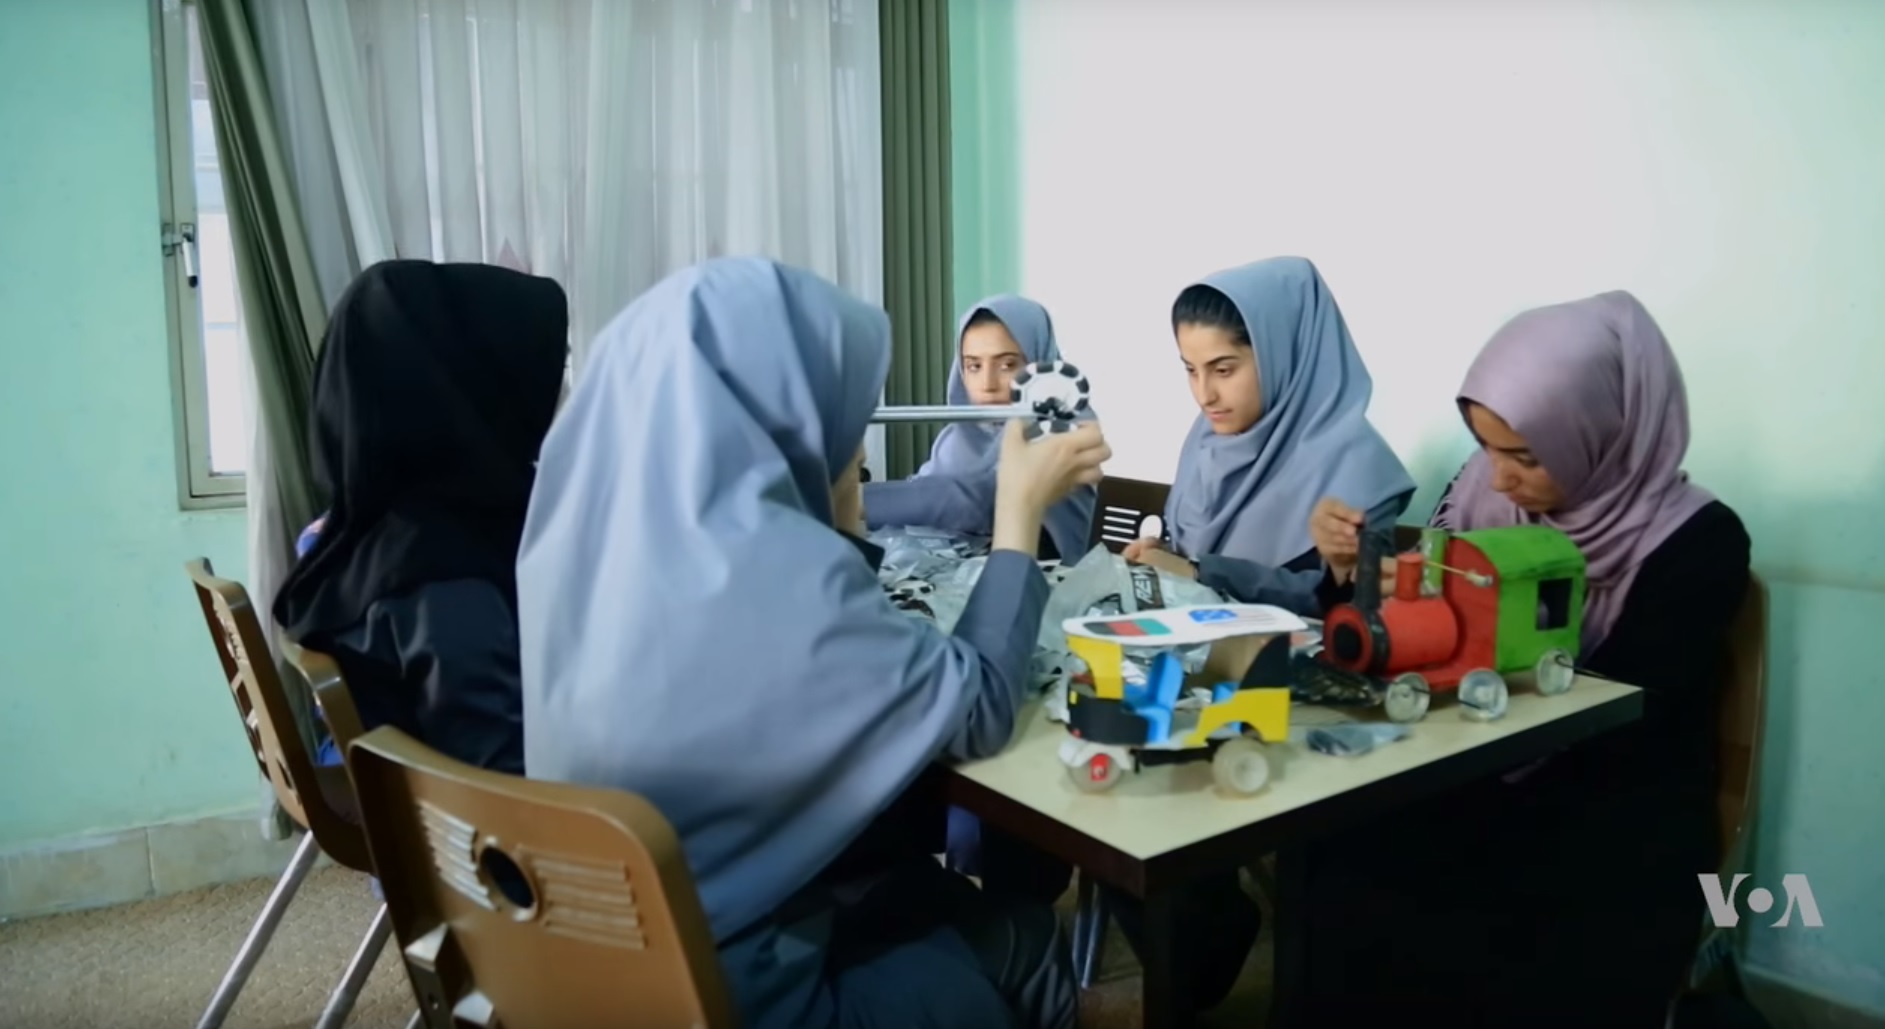 US Denies Visas for Gambian, Afghan Robotics Teams